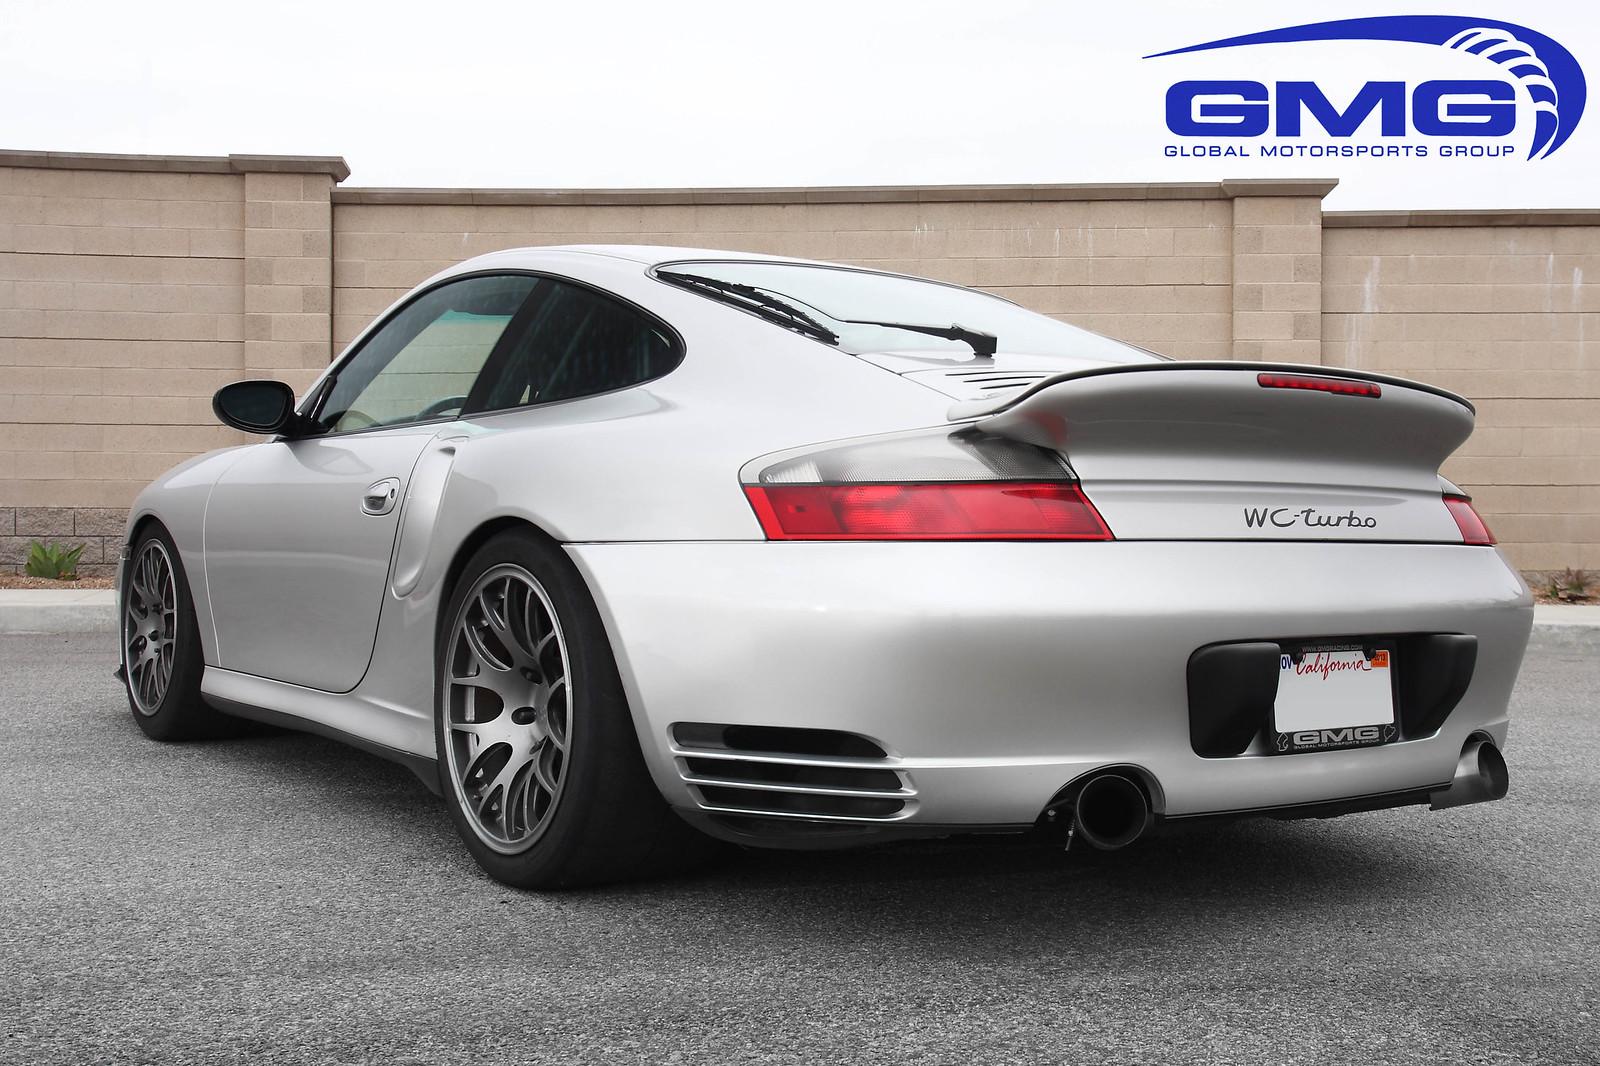 gmg racing september sale porsche 996 turbo exhaust and headers package deal rennlist. Black Bedroom Furniture Sets. Home Design Ideas